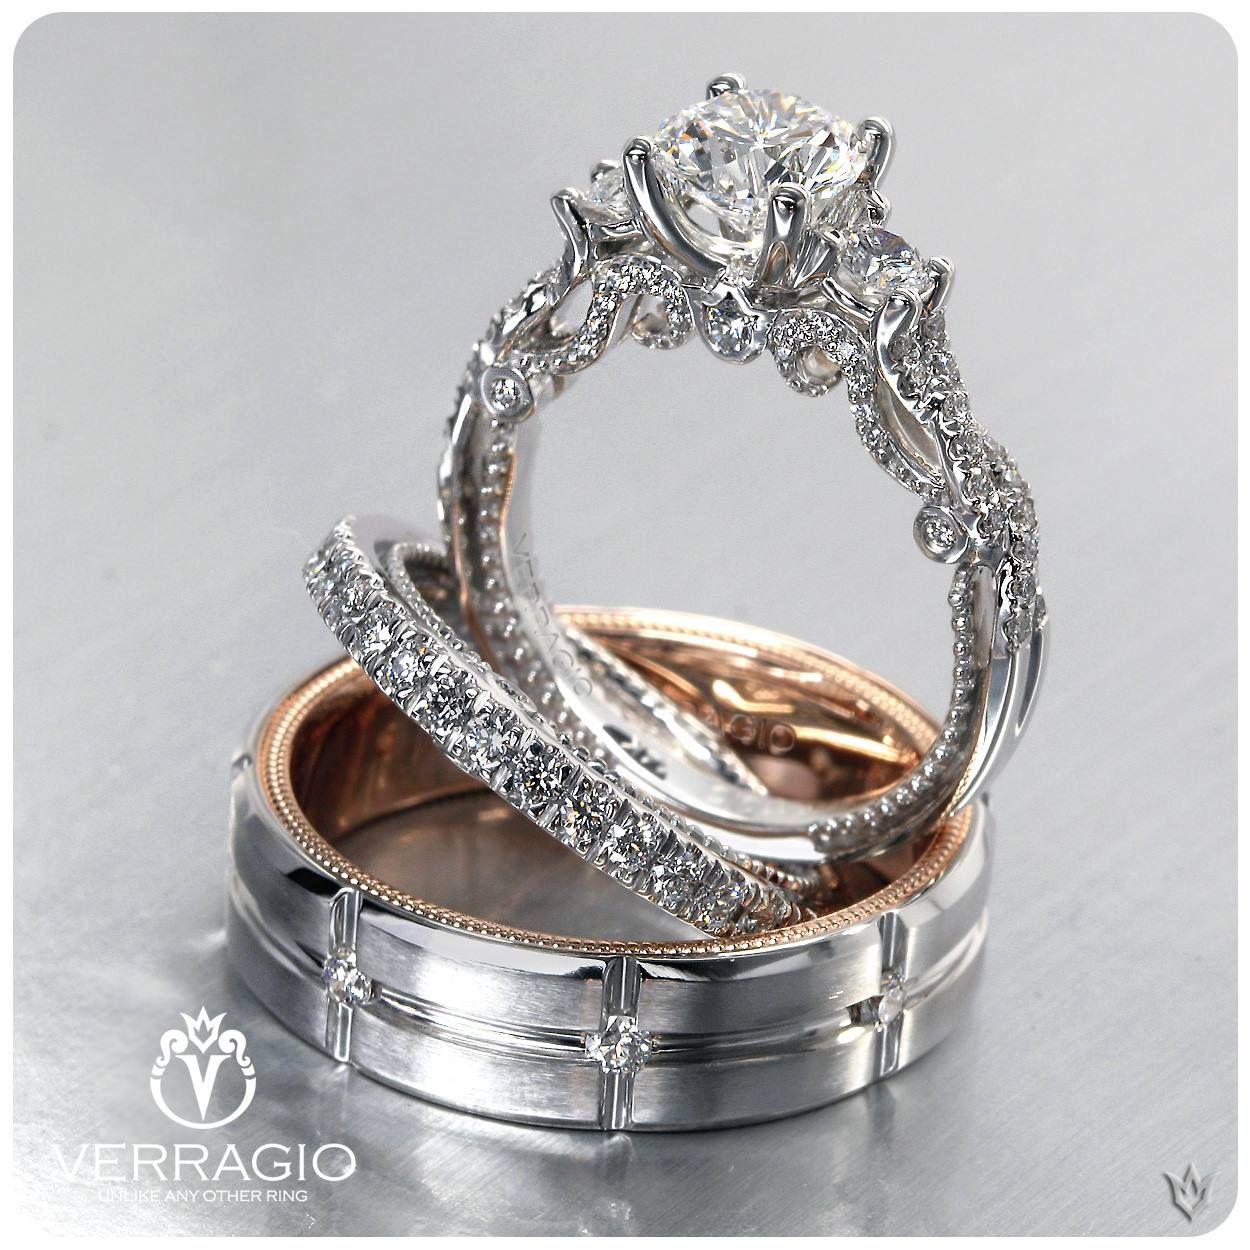 The Beautiful Verragio Insignia 7074r 0426w Men S Wedding Ring Vw